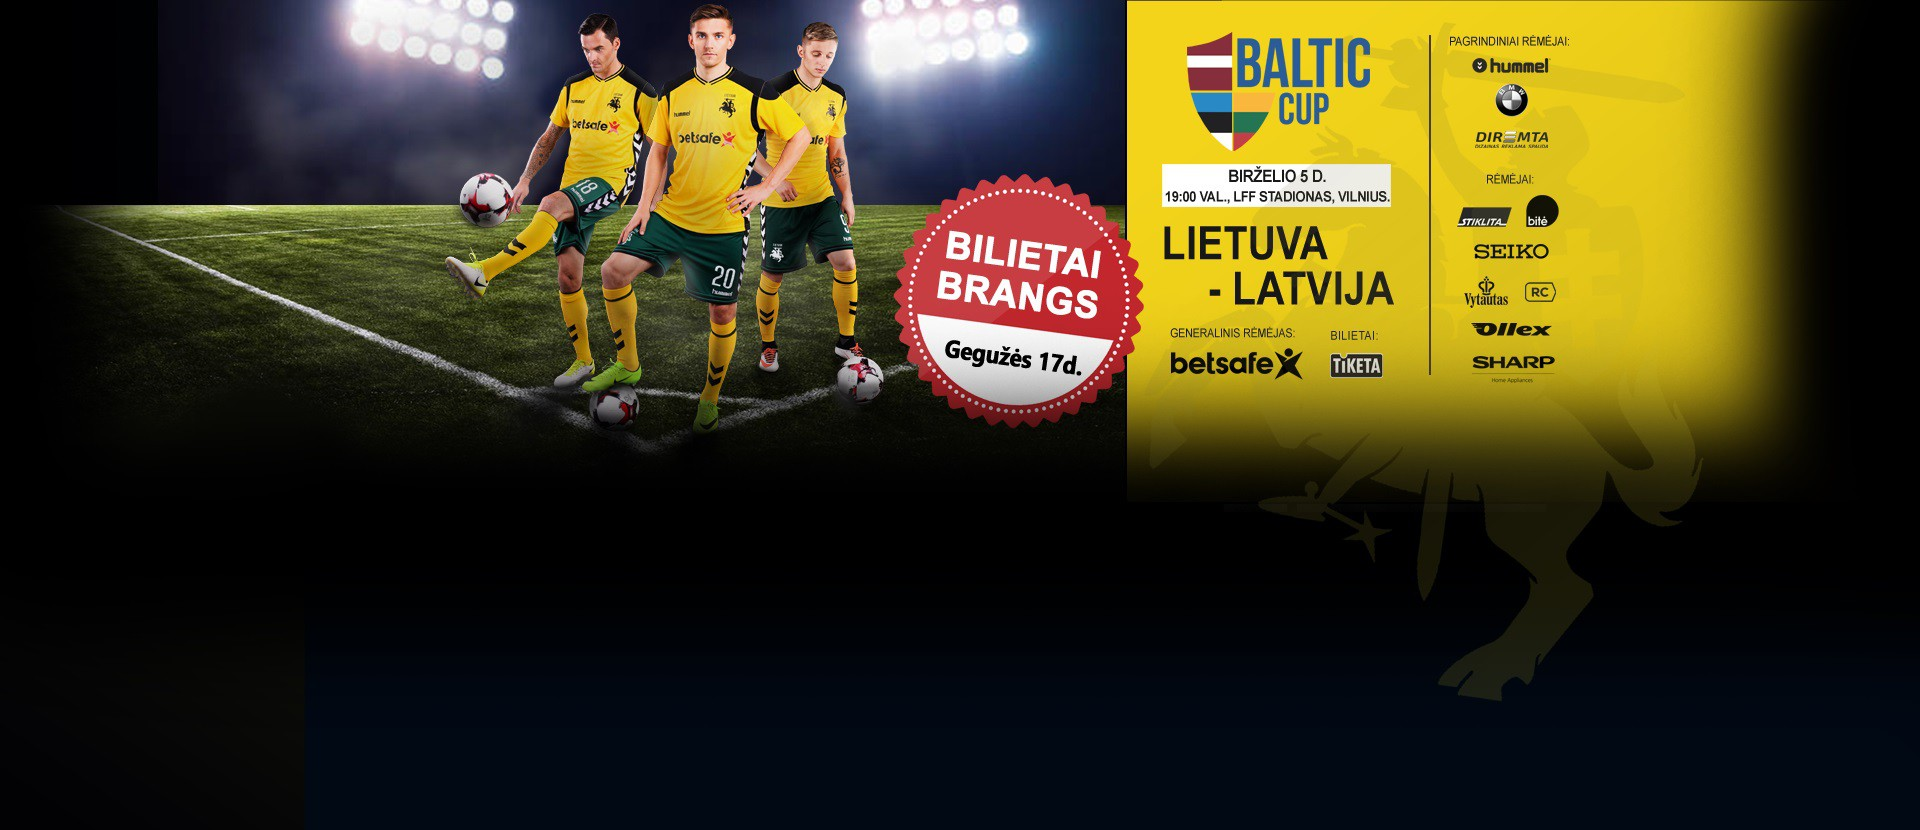 Baltijos taurė: Lietuva – Latvija